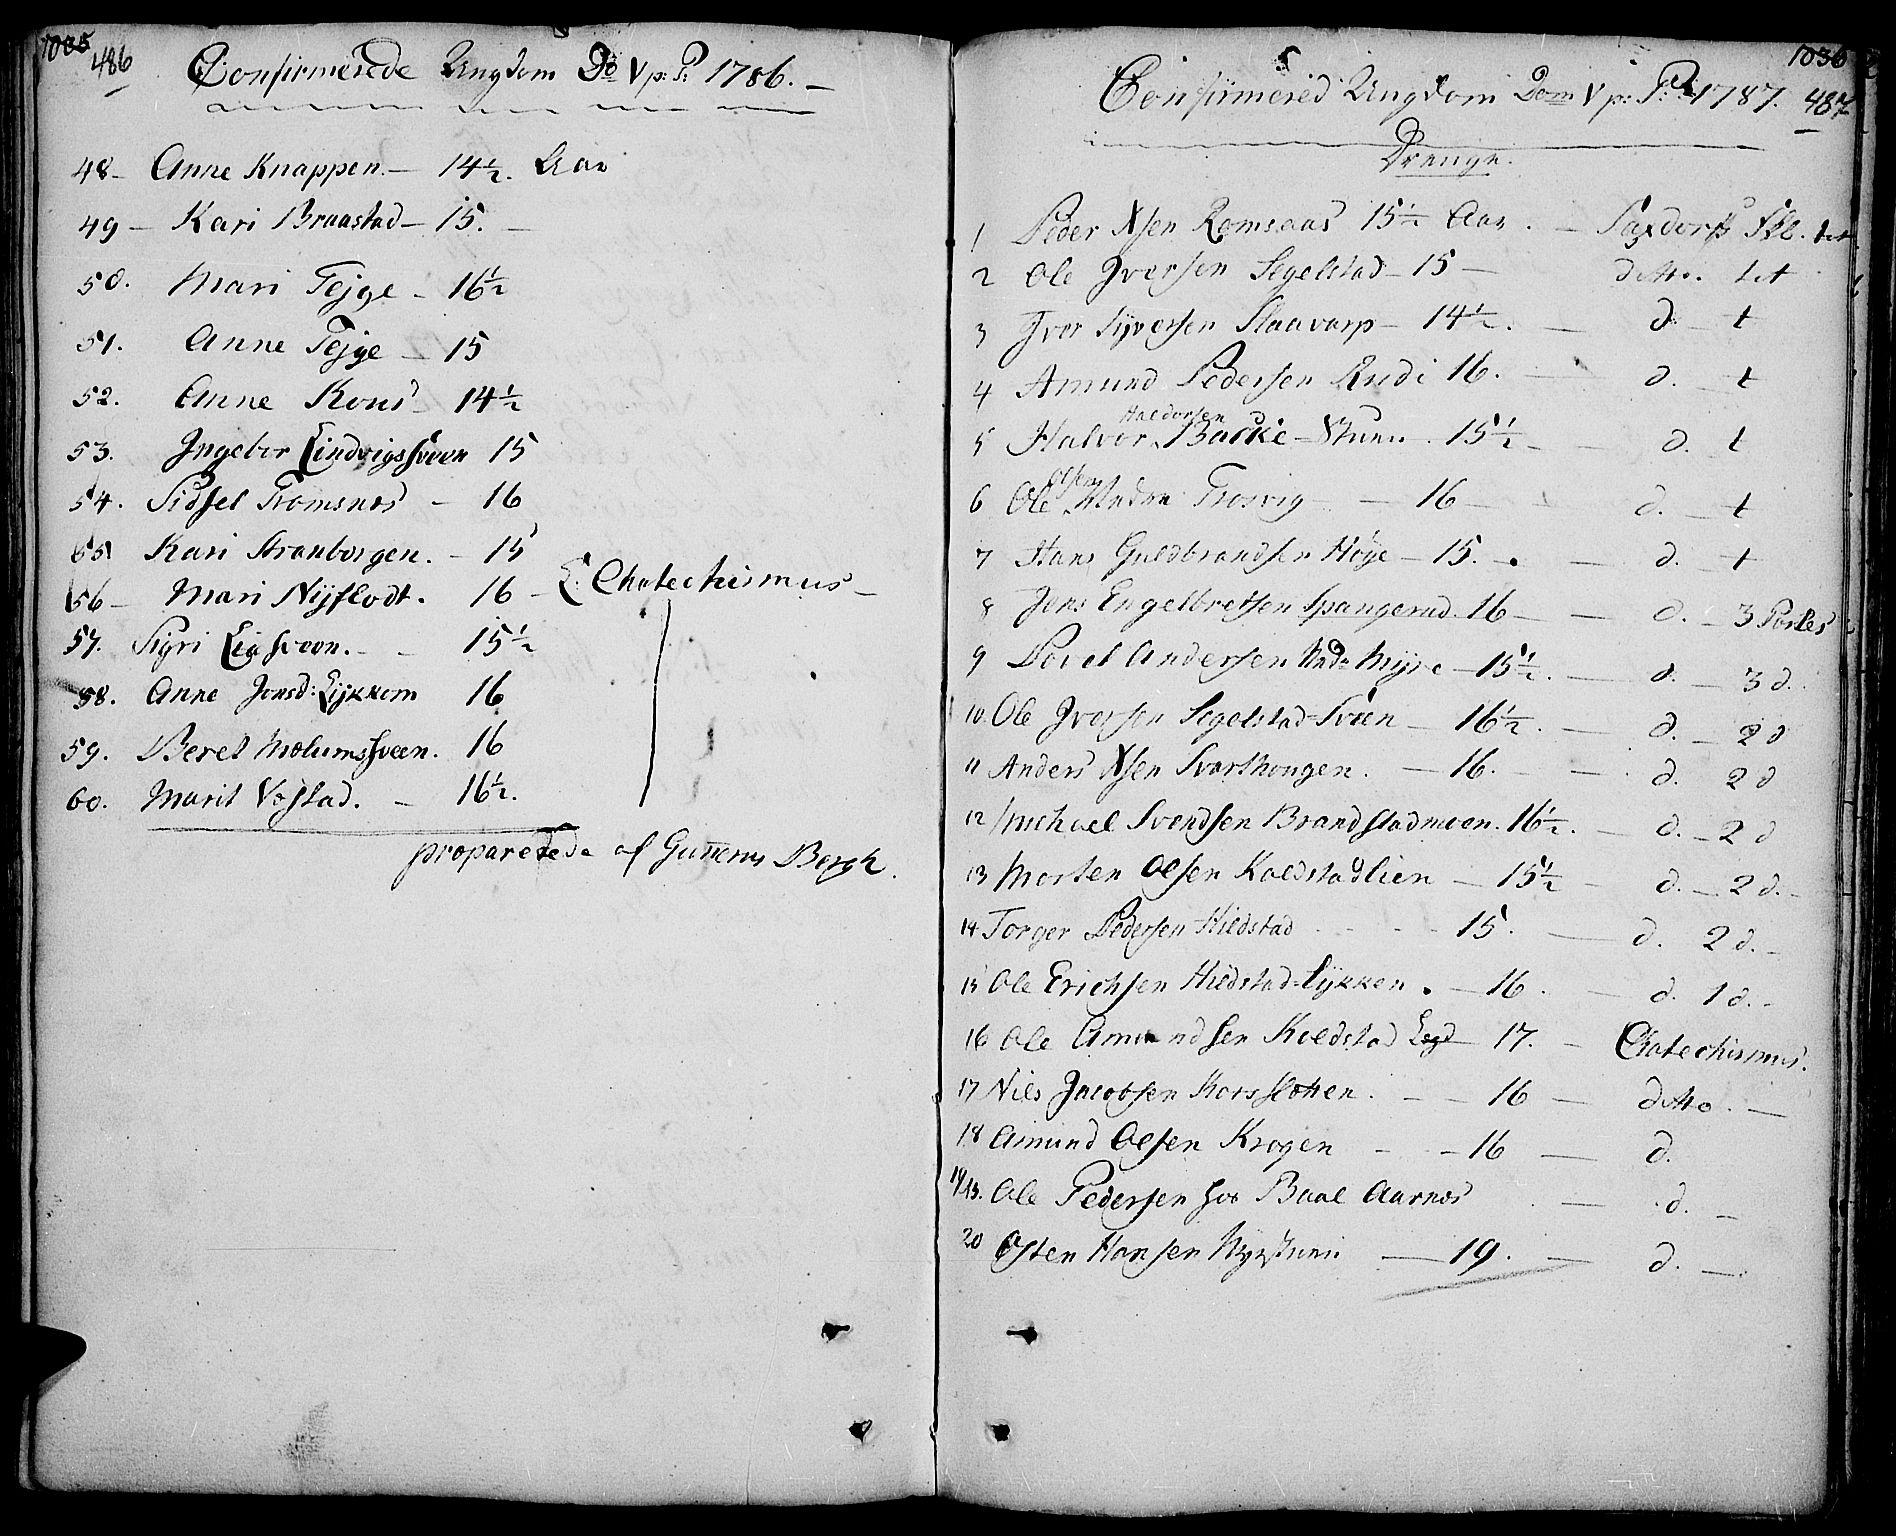 SAH, Ringebu prestekontor, Ministerialbok nr. 3, 1781-1820, s. 486-487